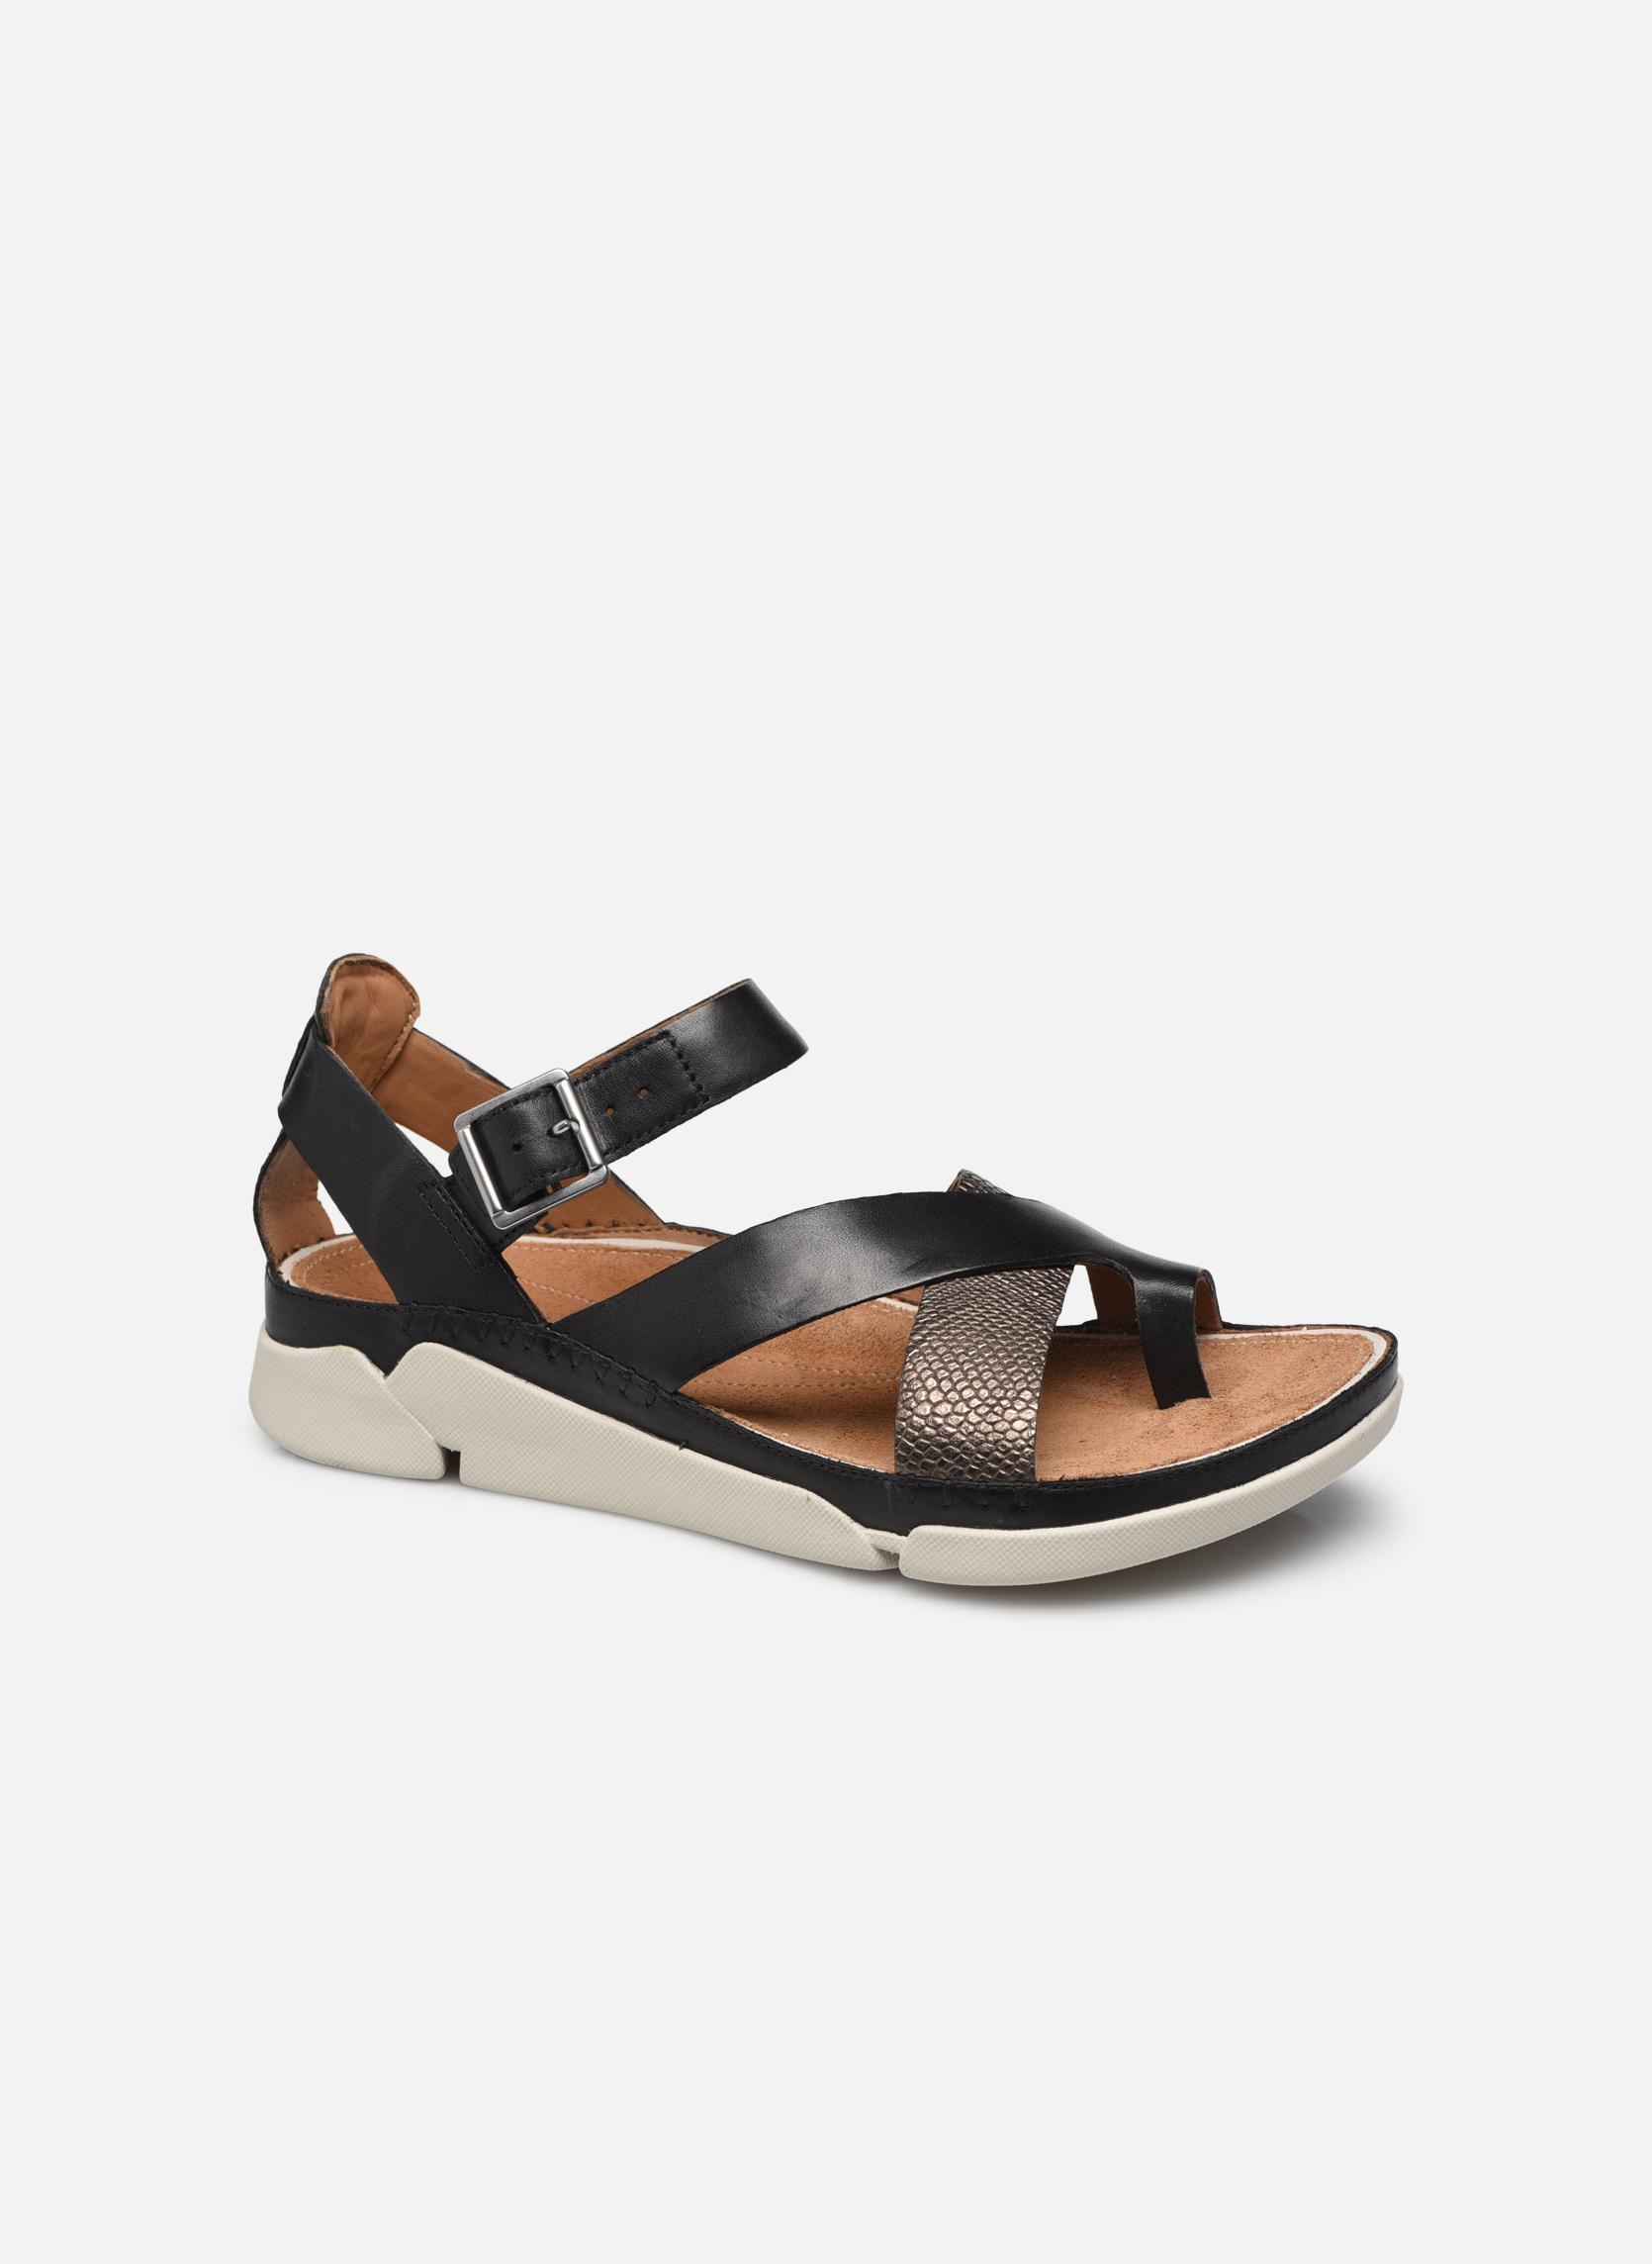 Sandales et nu-pieds Femme Tri Ariana